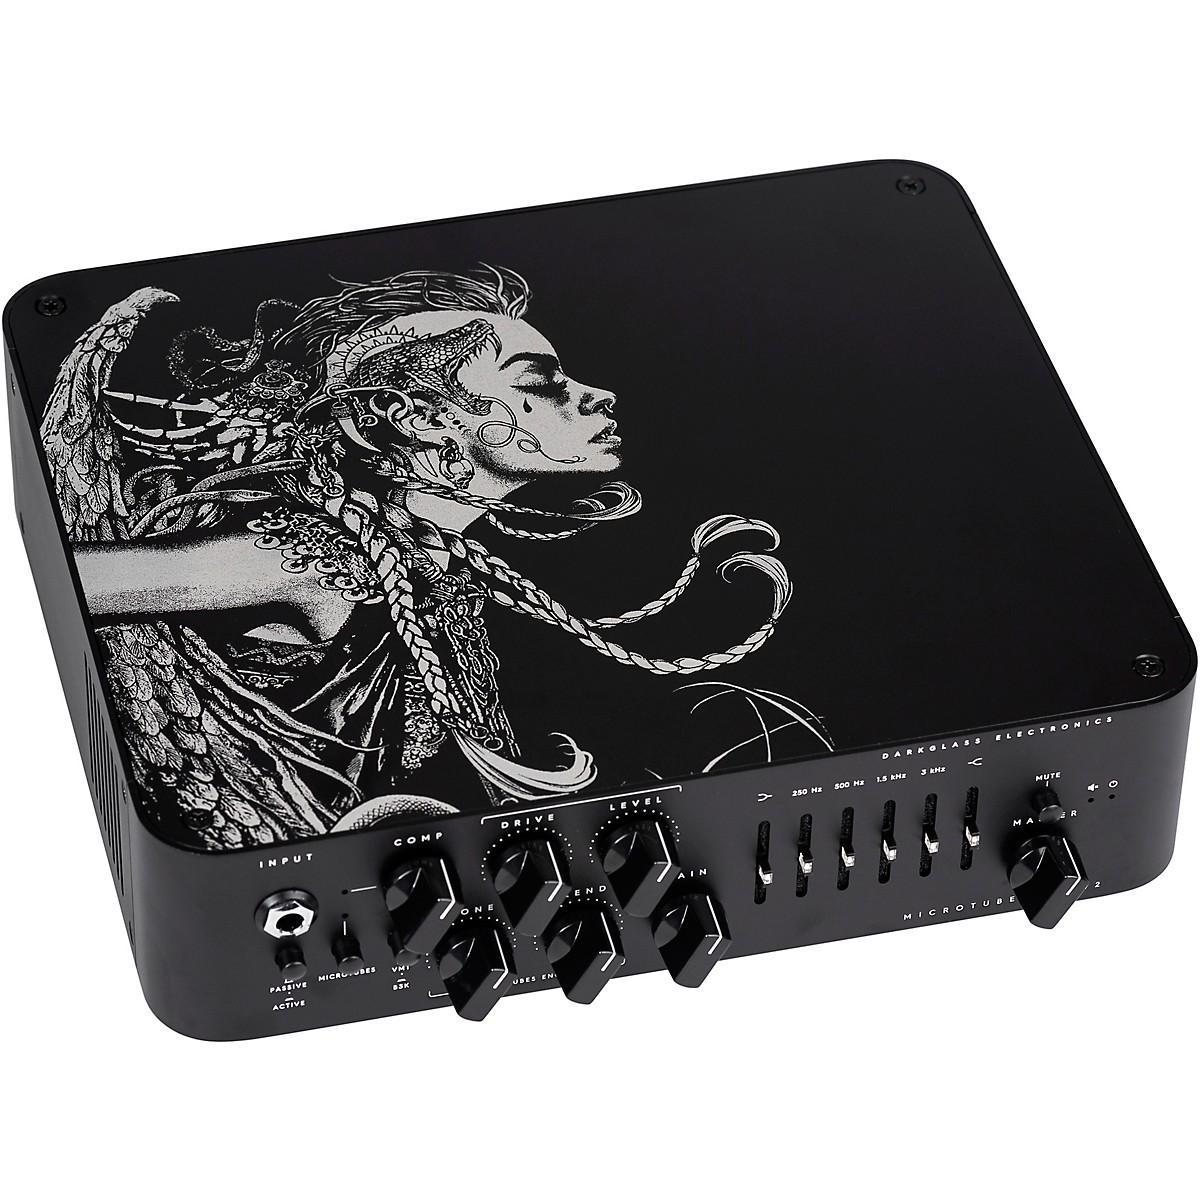 Darkglass Microtubes 900 V2 Medusa 900W Bass Amp Head